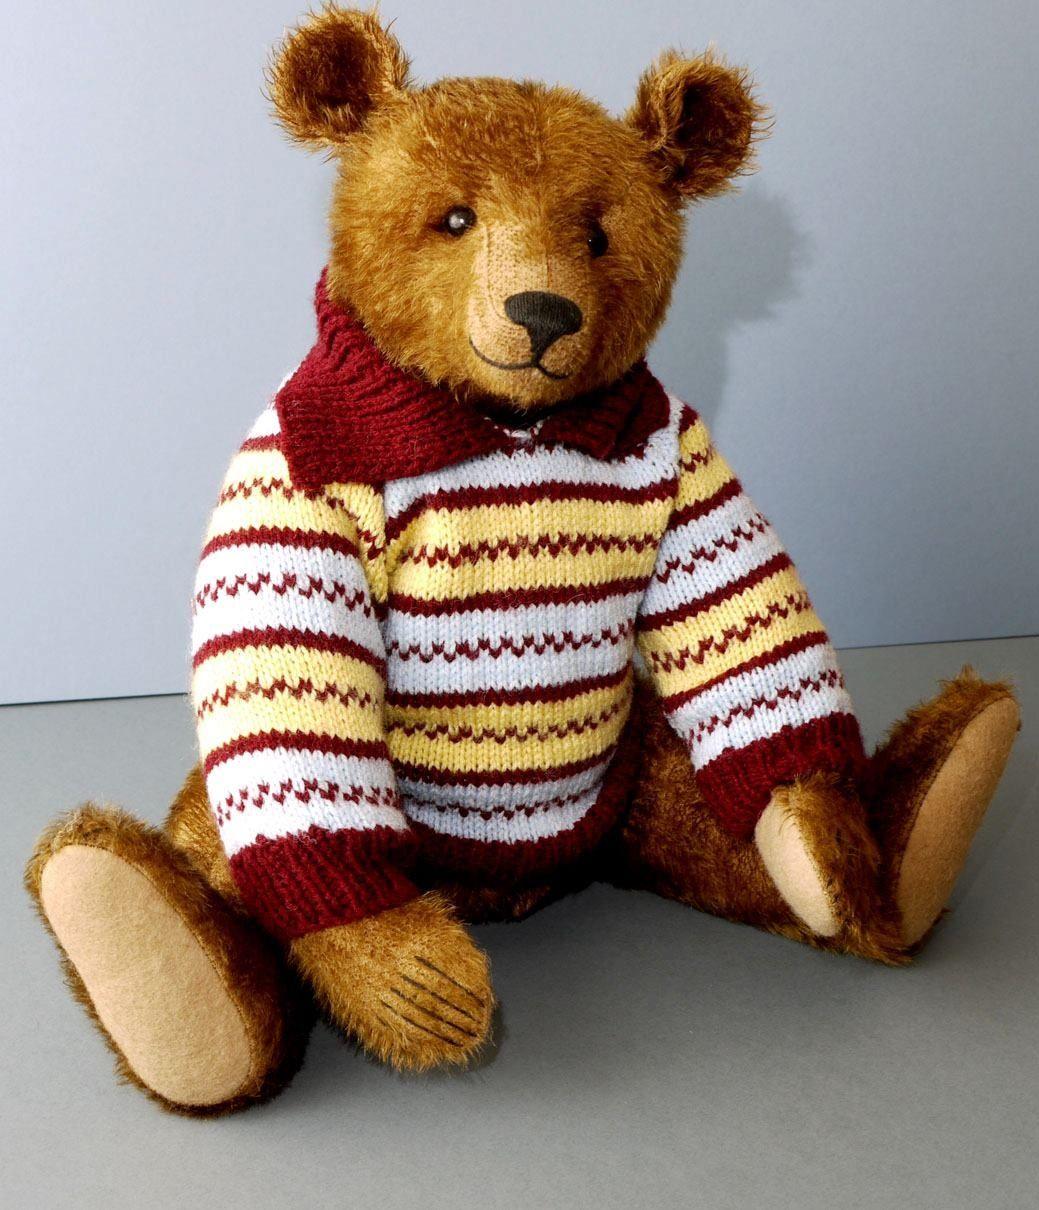 Bear In A Sweater 17 Inch Classic Teddy Bear